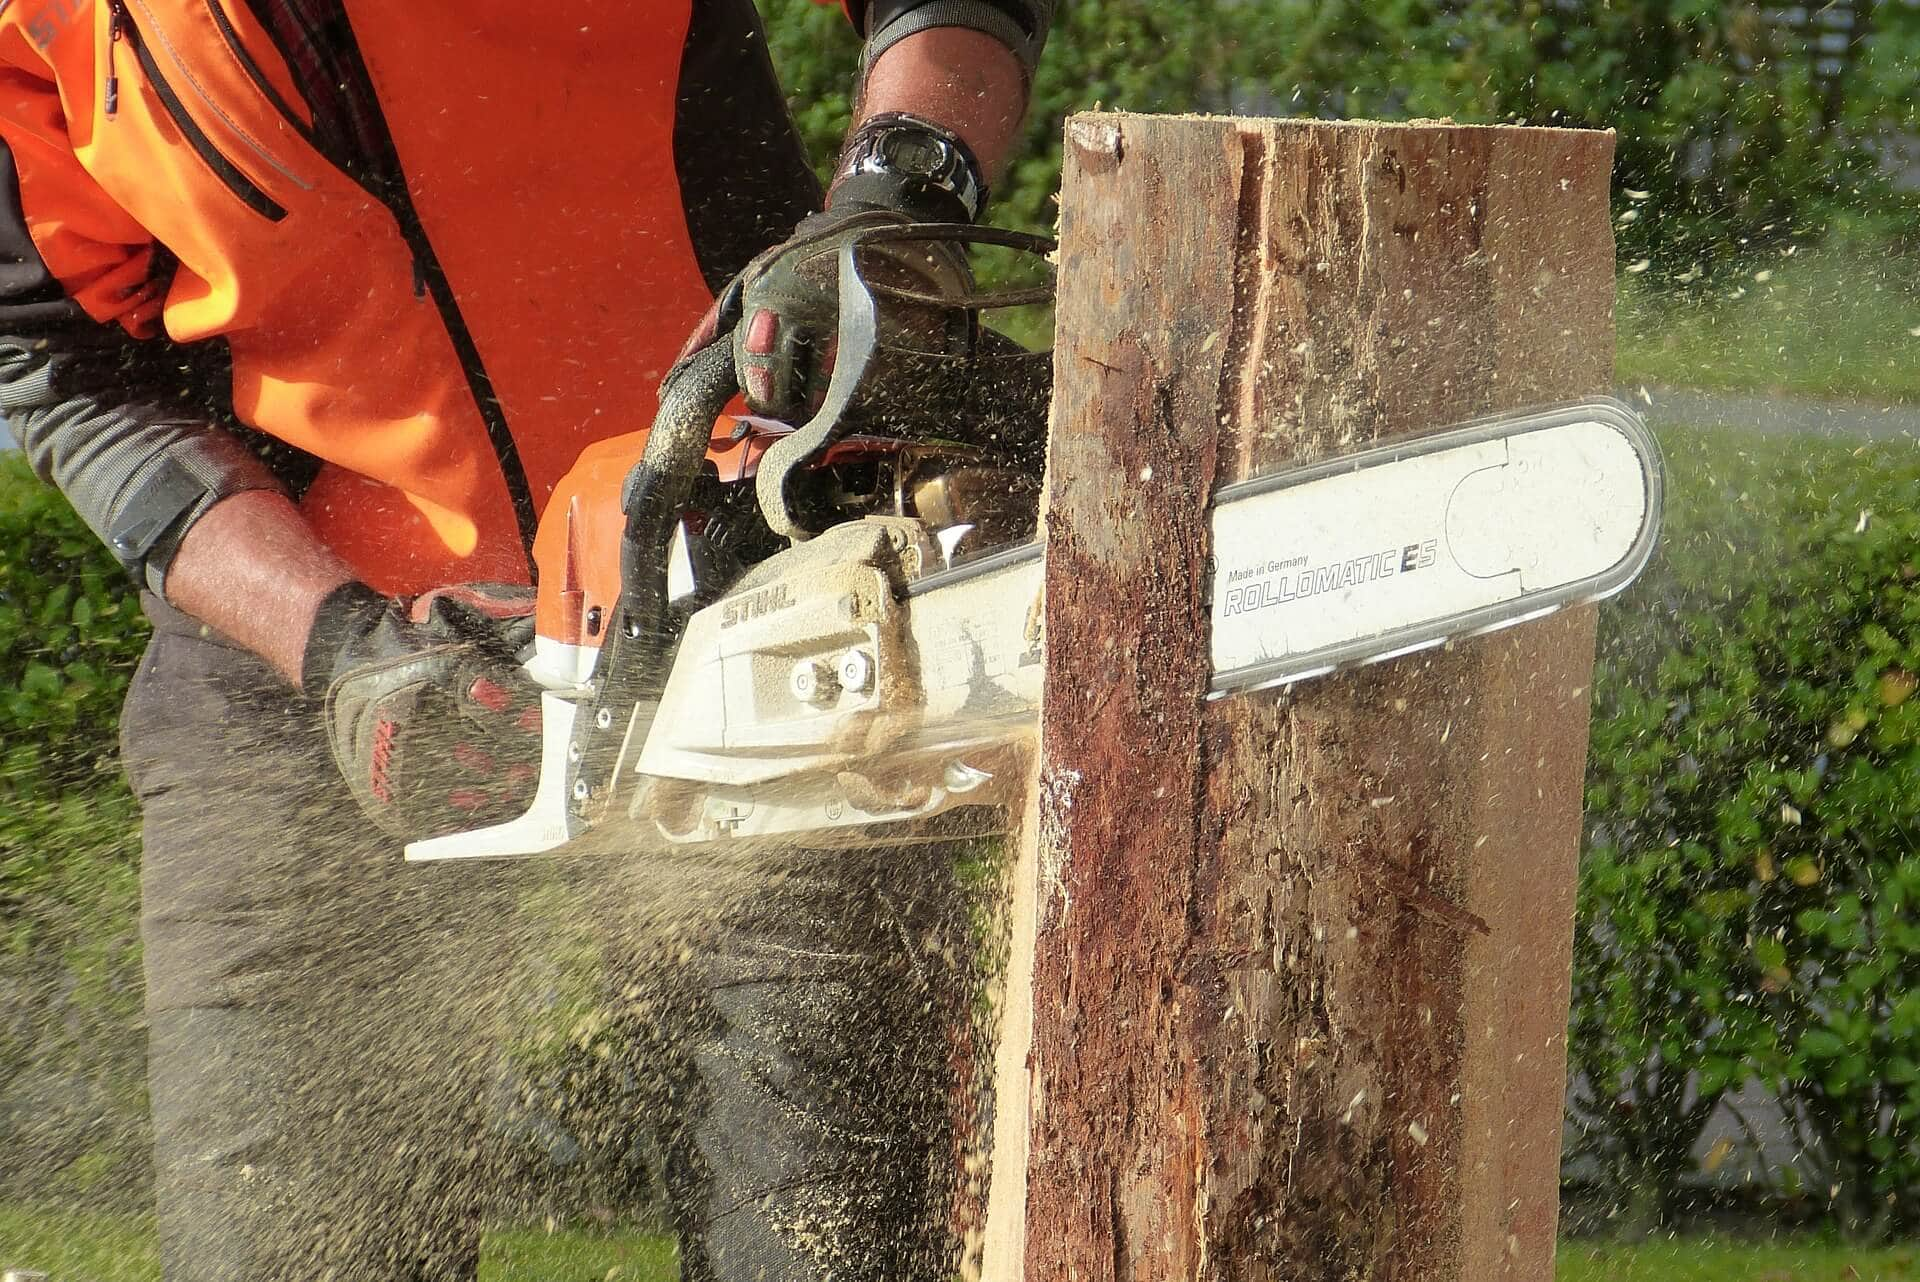 Baumschnitt mit Motorsäge